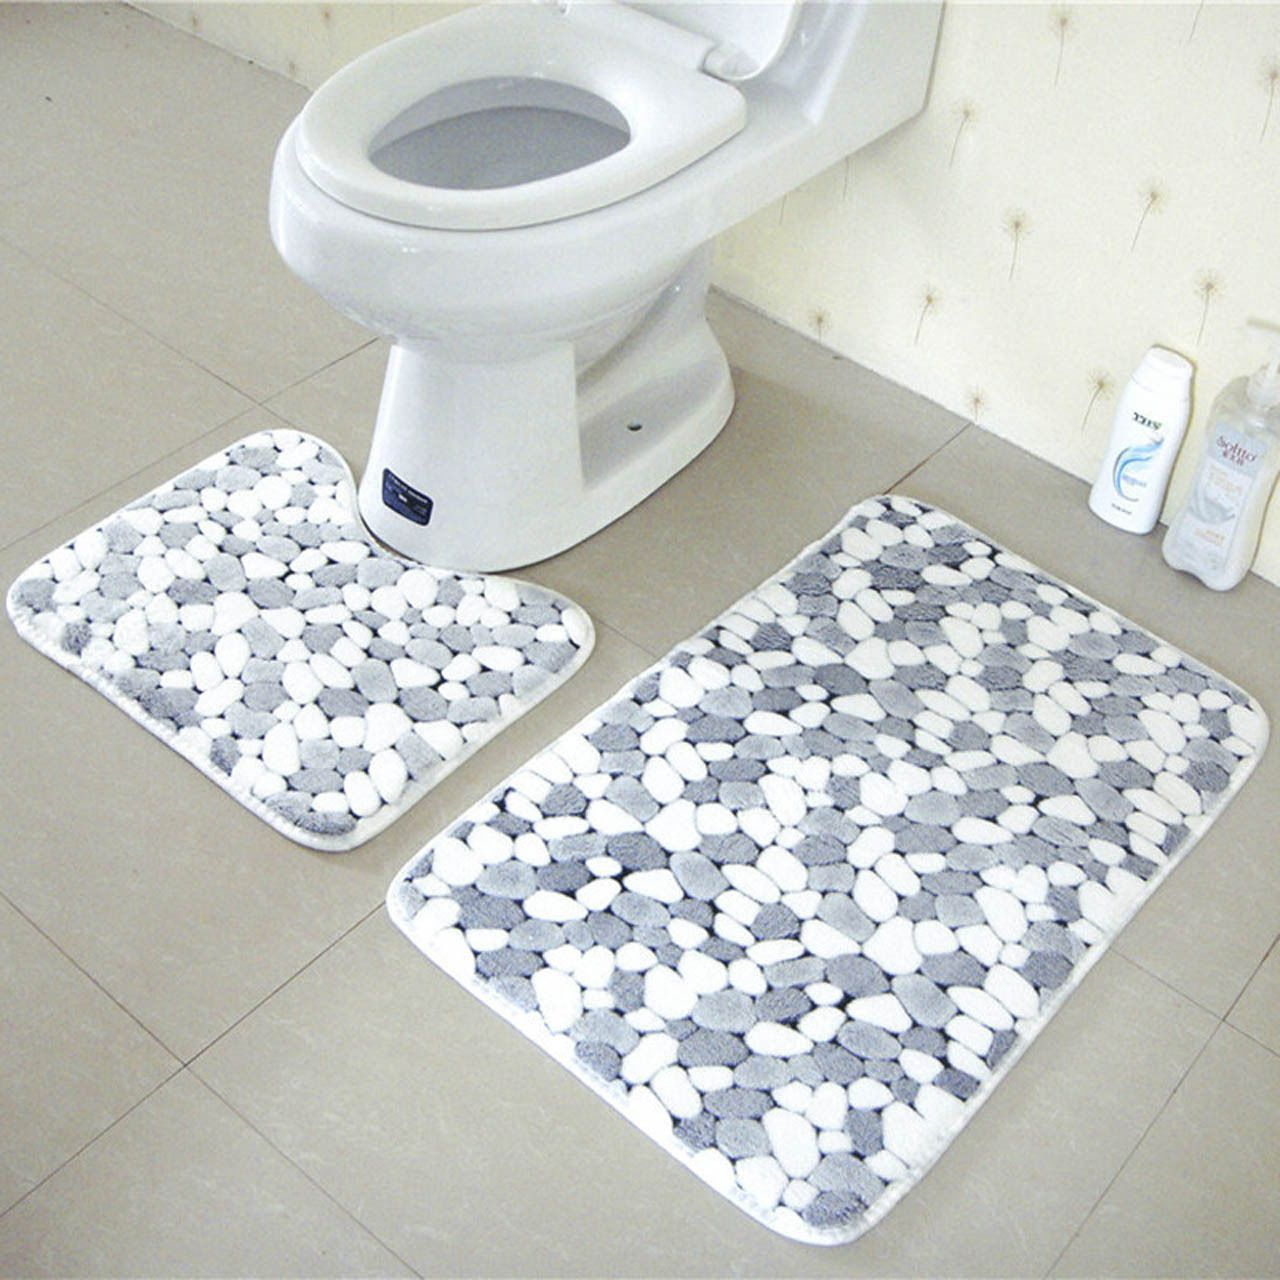 2pcs Soft Stone Pebbles Pattern Bath Pedestal Rug Cover Bathroom